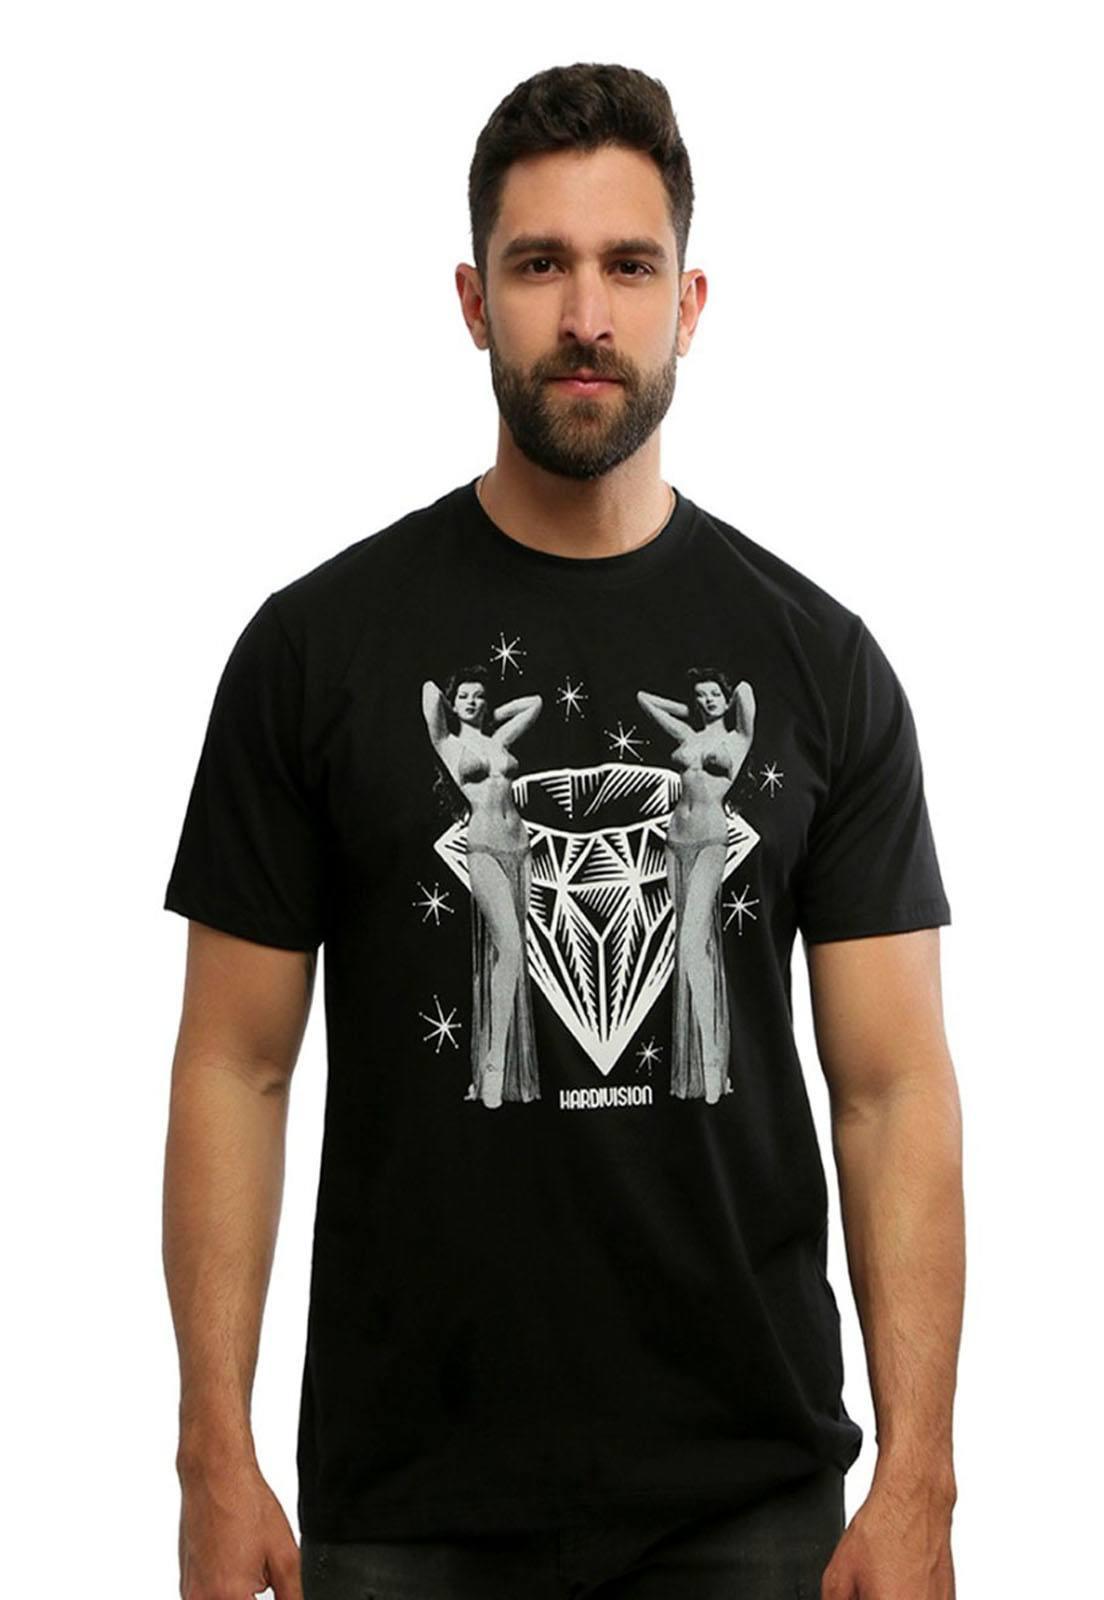 Camiseta masculina preta Burlesque - 100% algodão - Hardivision